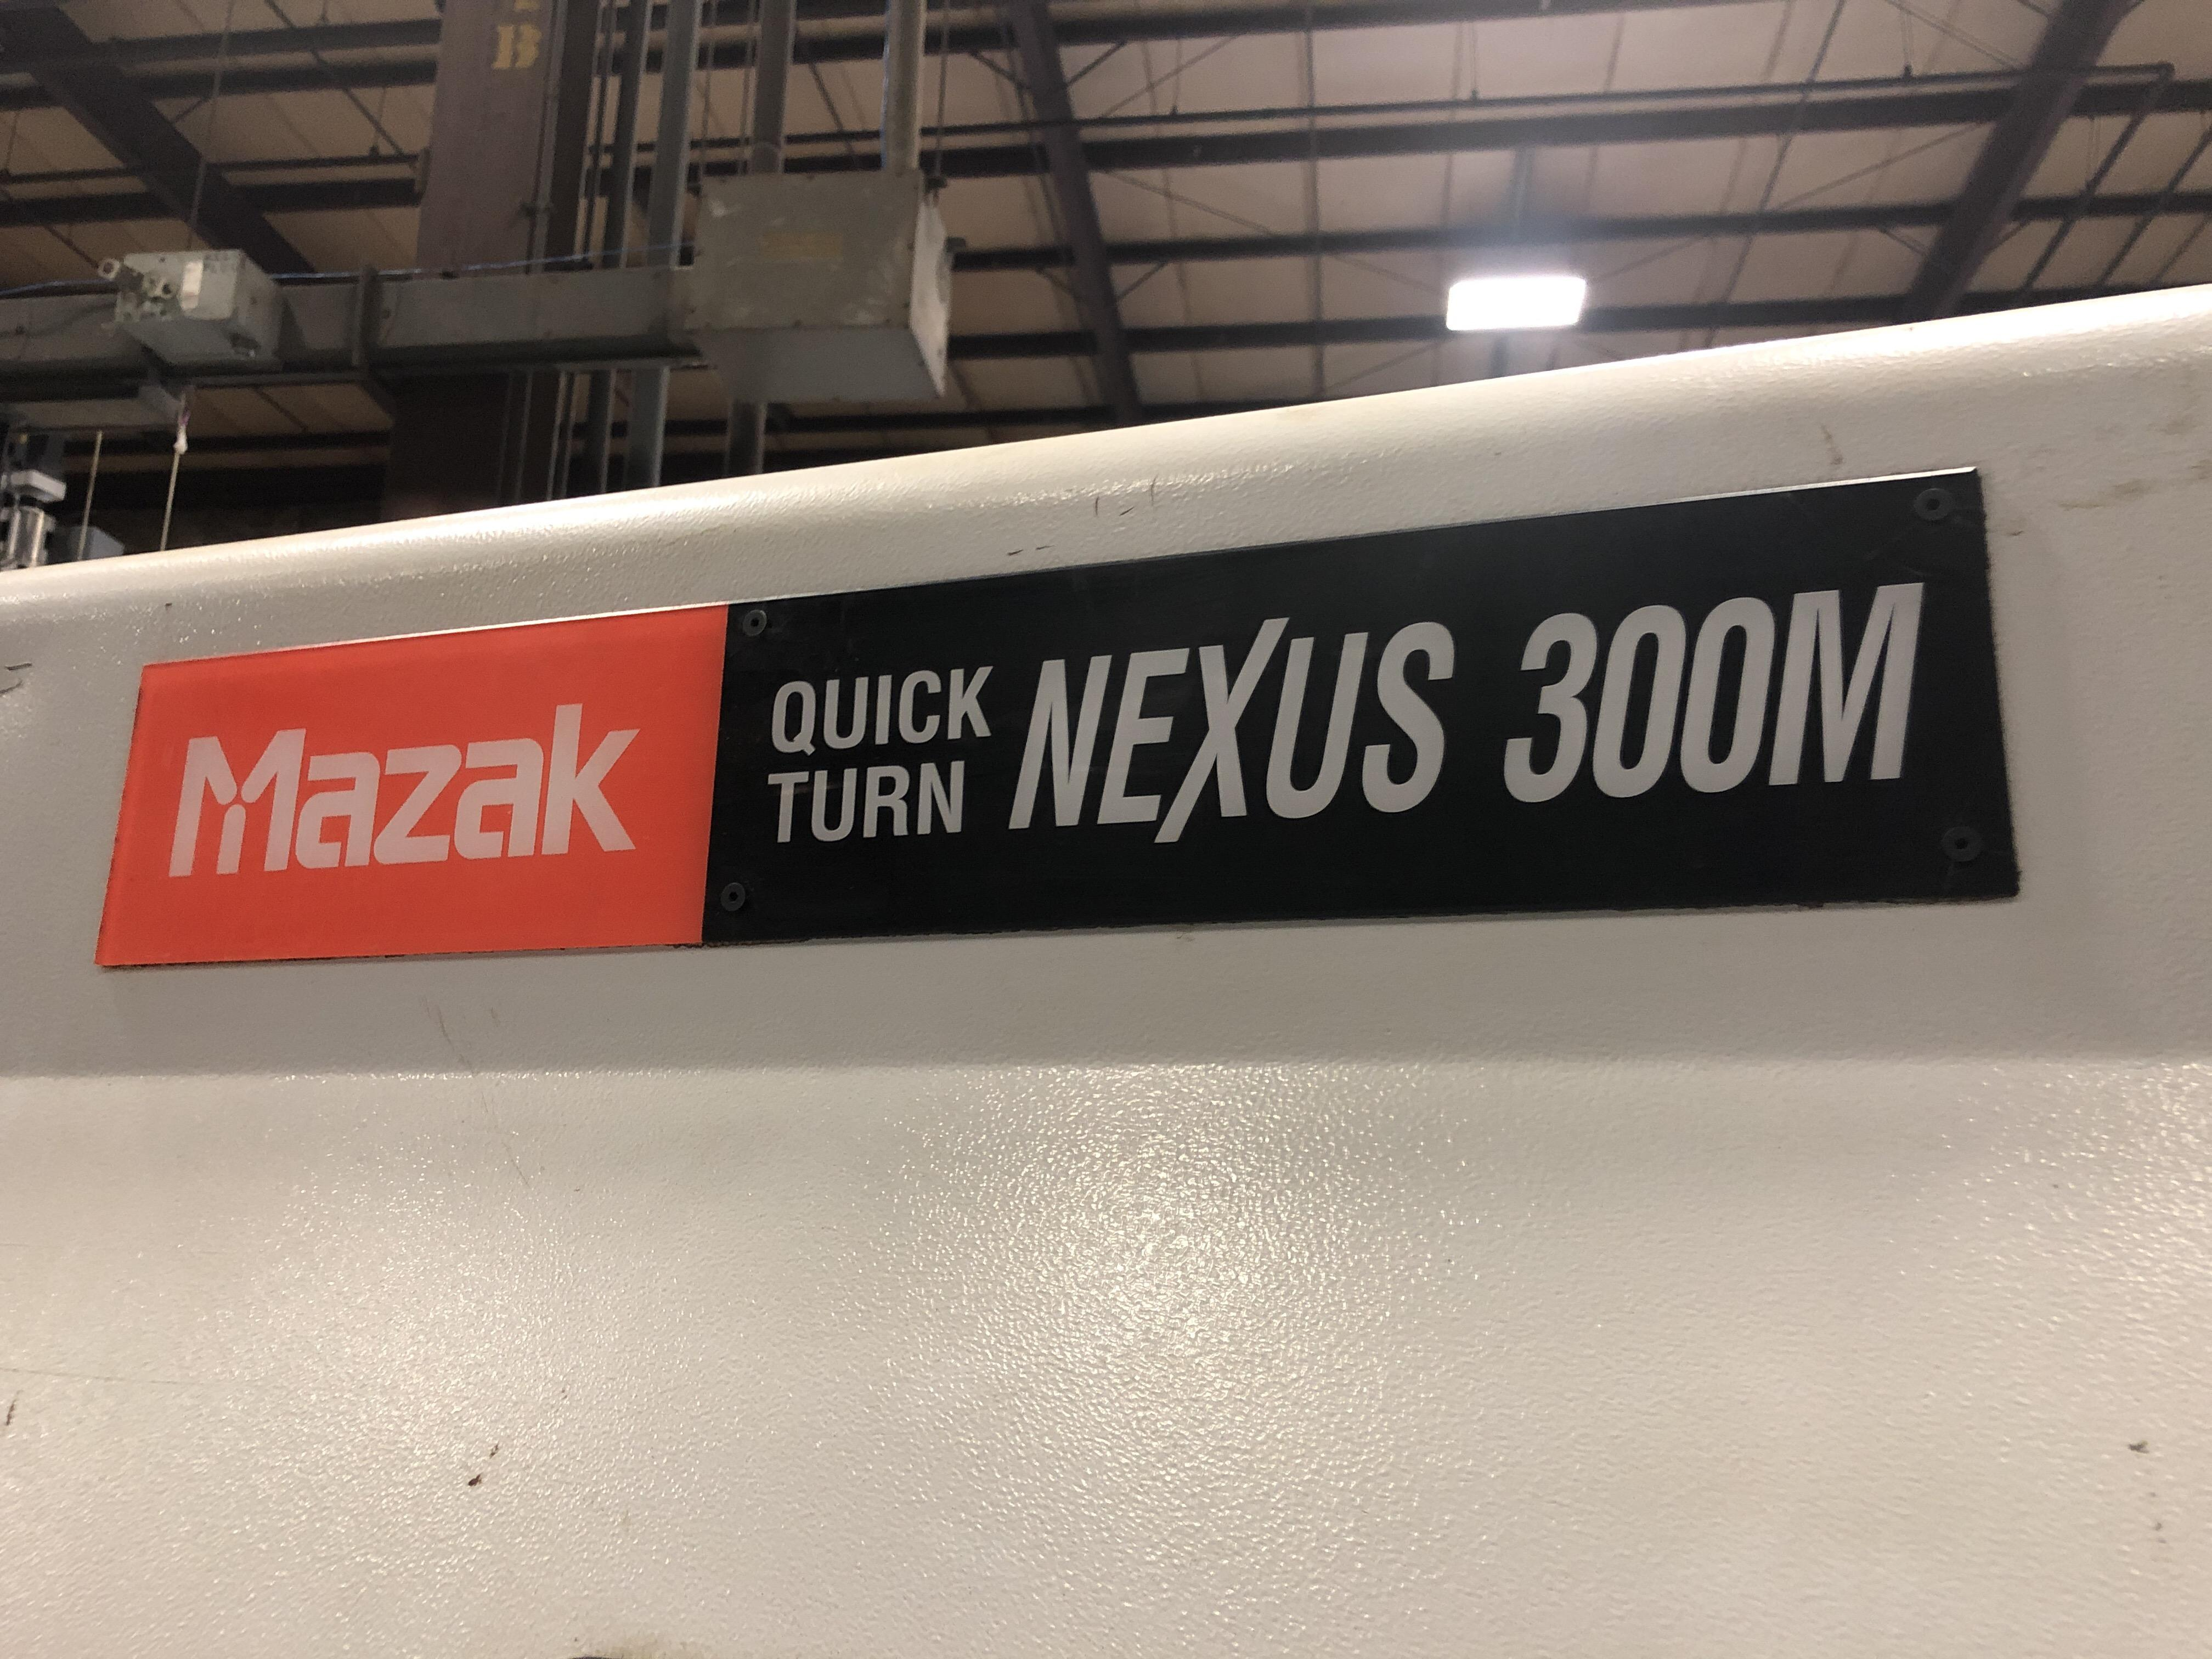 2005 Mazak QTN-300M - CNC Horizontal Lathe